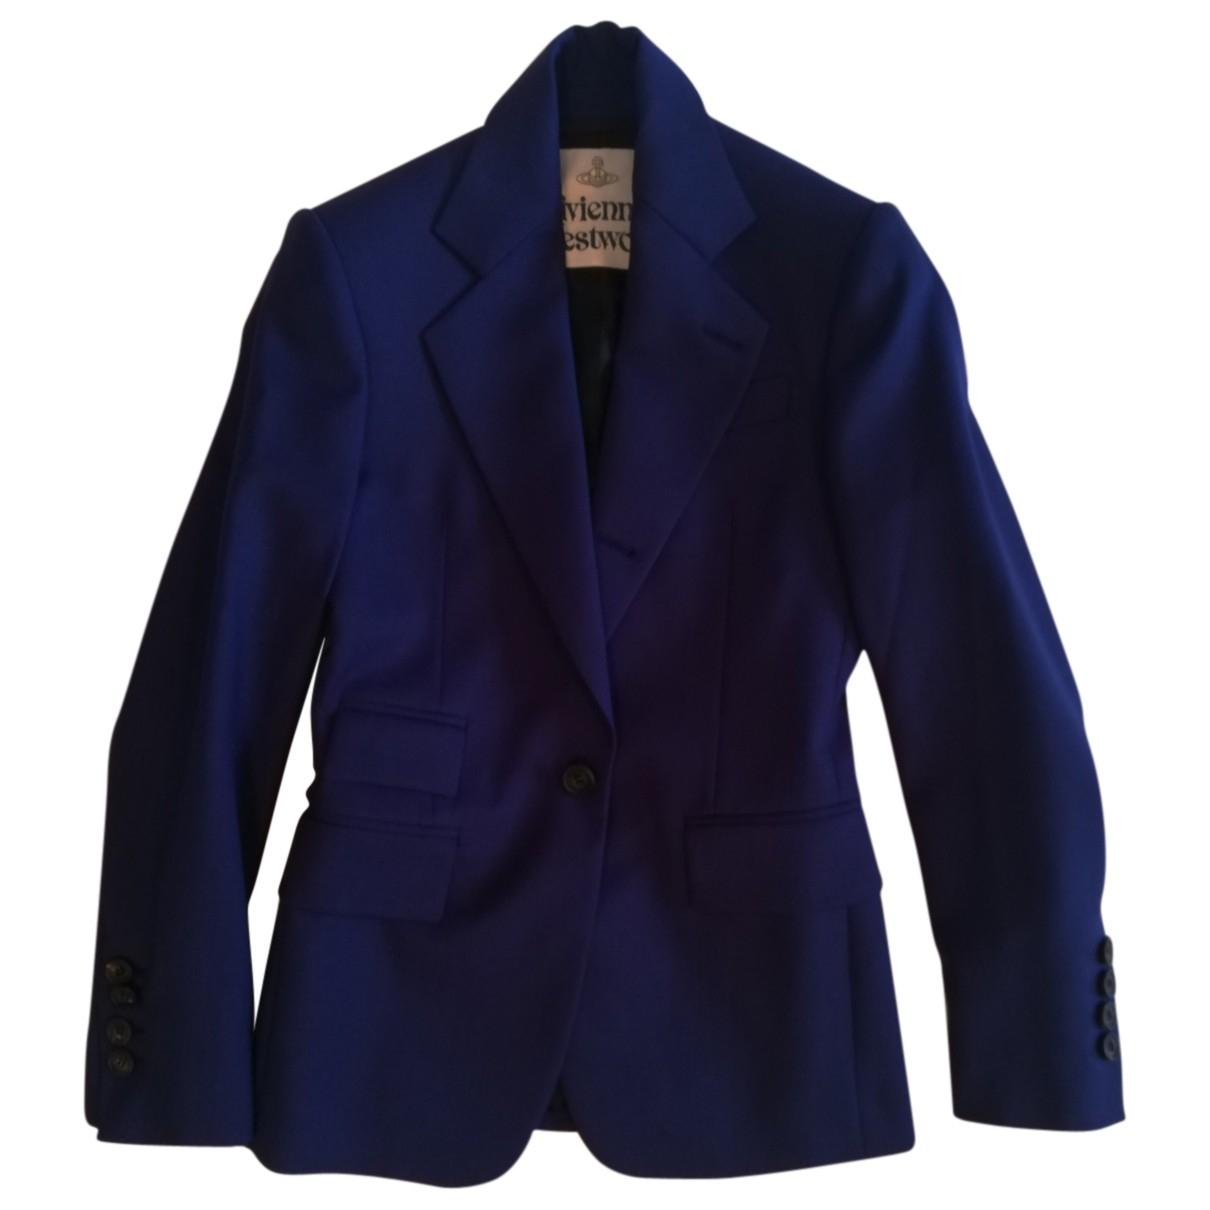 Vivienne Westwood N Blue Wool jacket for Women 38 IT